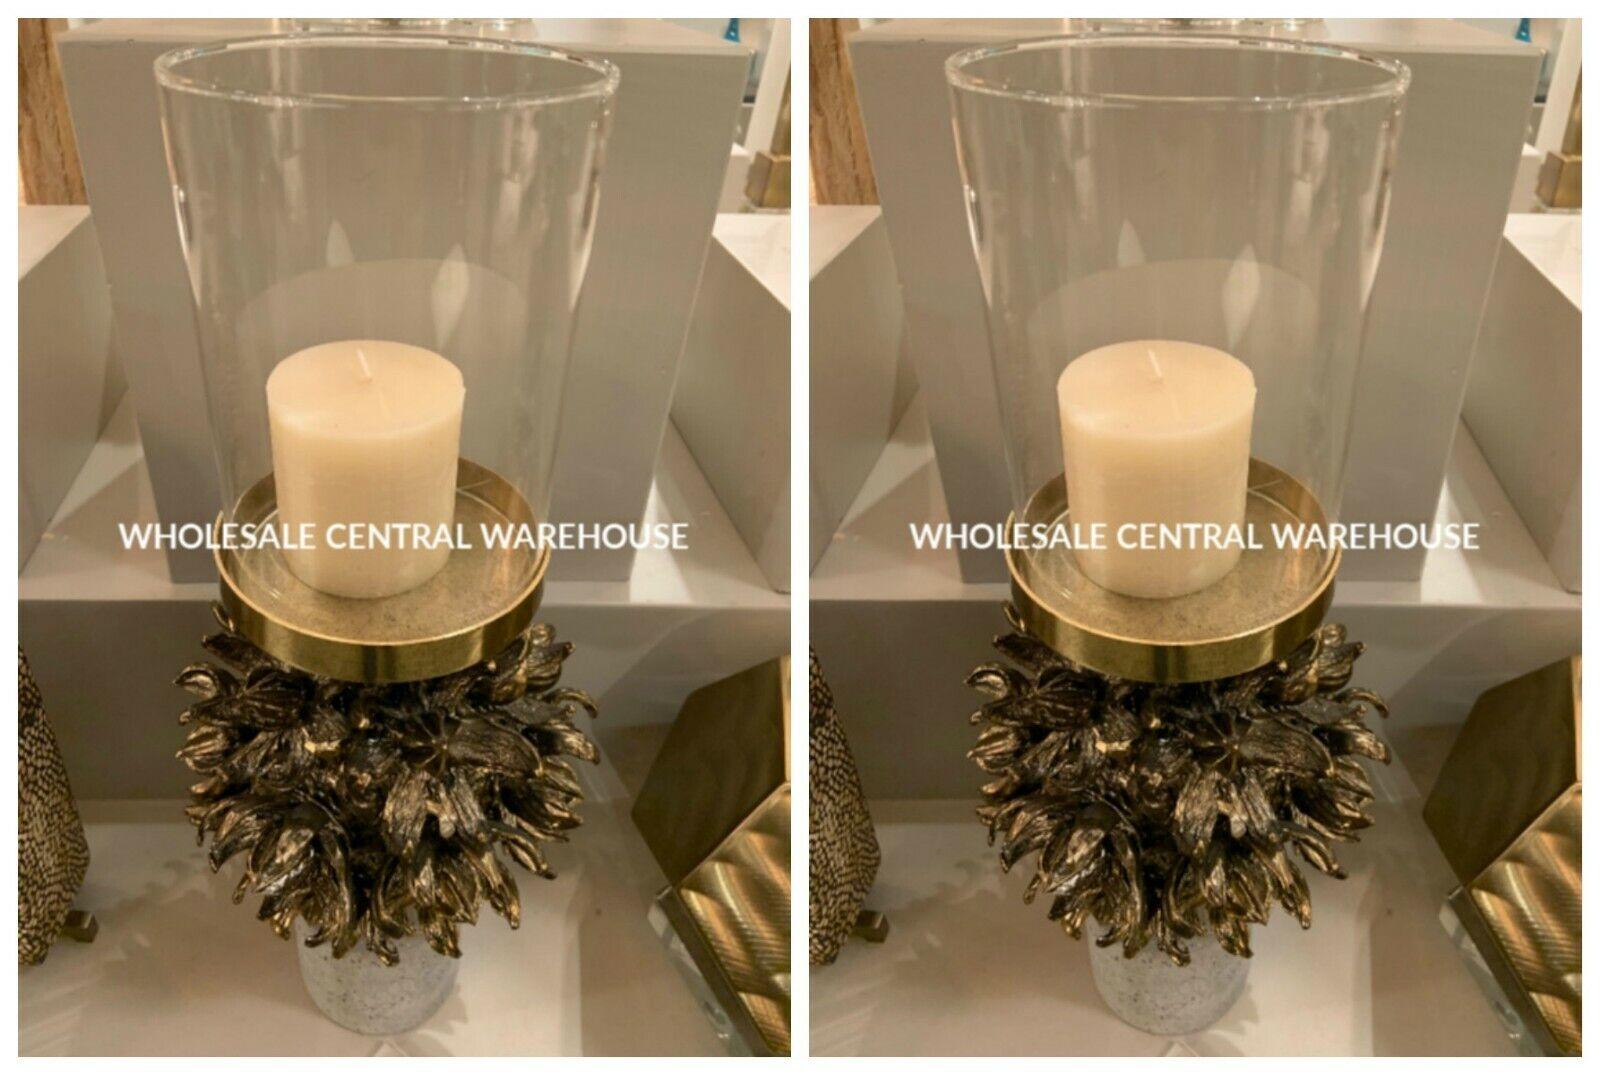 TWO AUTOGRAPH CANDLE HOLDER CAST HAWAIIAN POD PILLAR CONCRETE BASE GLASS GLOBE